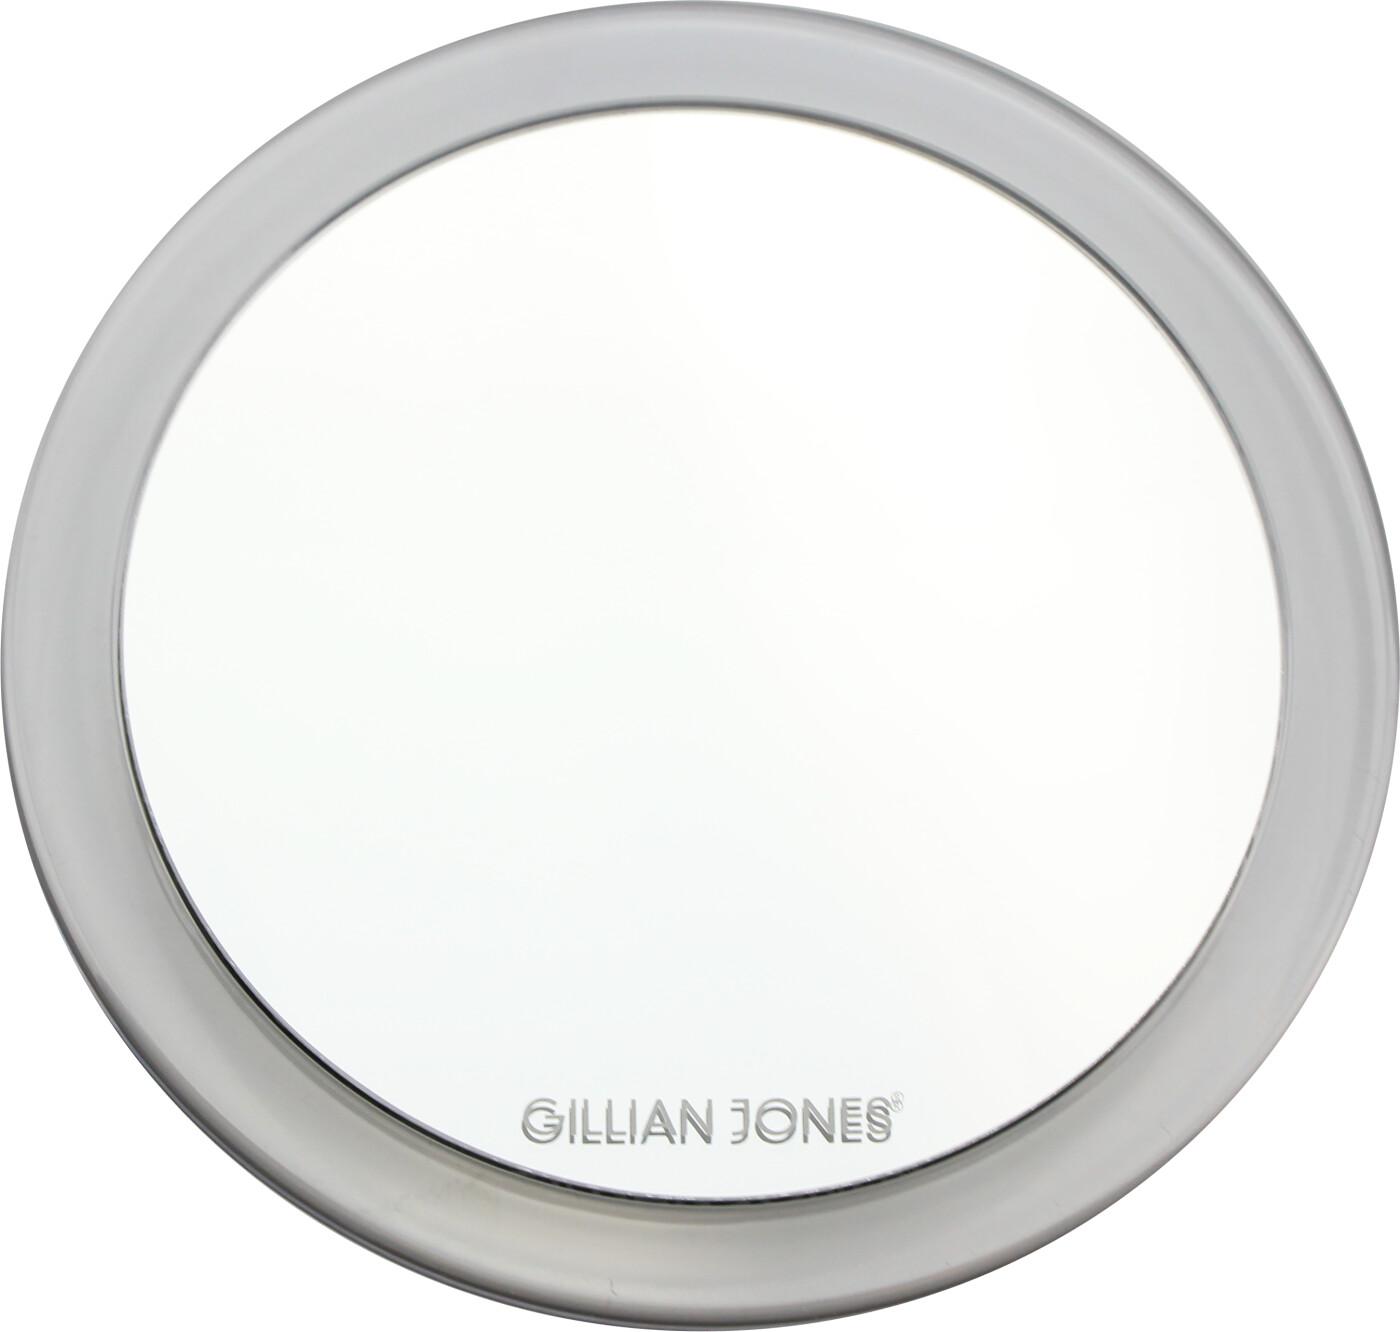 Image of   Gillian Jones - Spejl / Makeup Spejl Med Sugekopper - X10